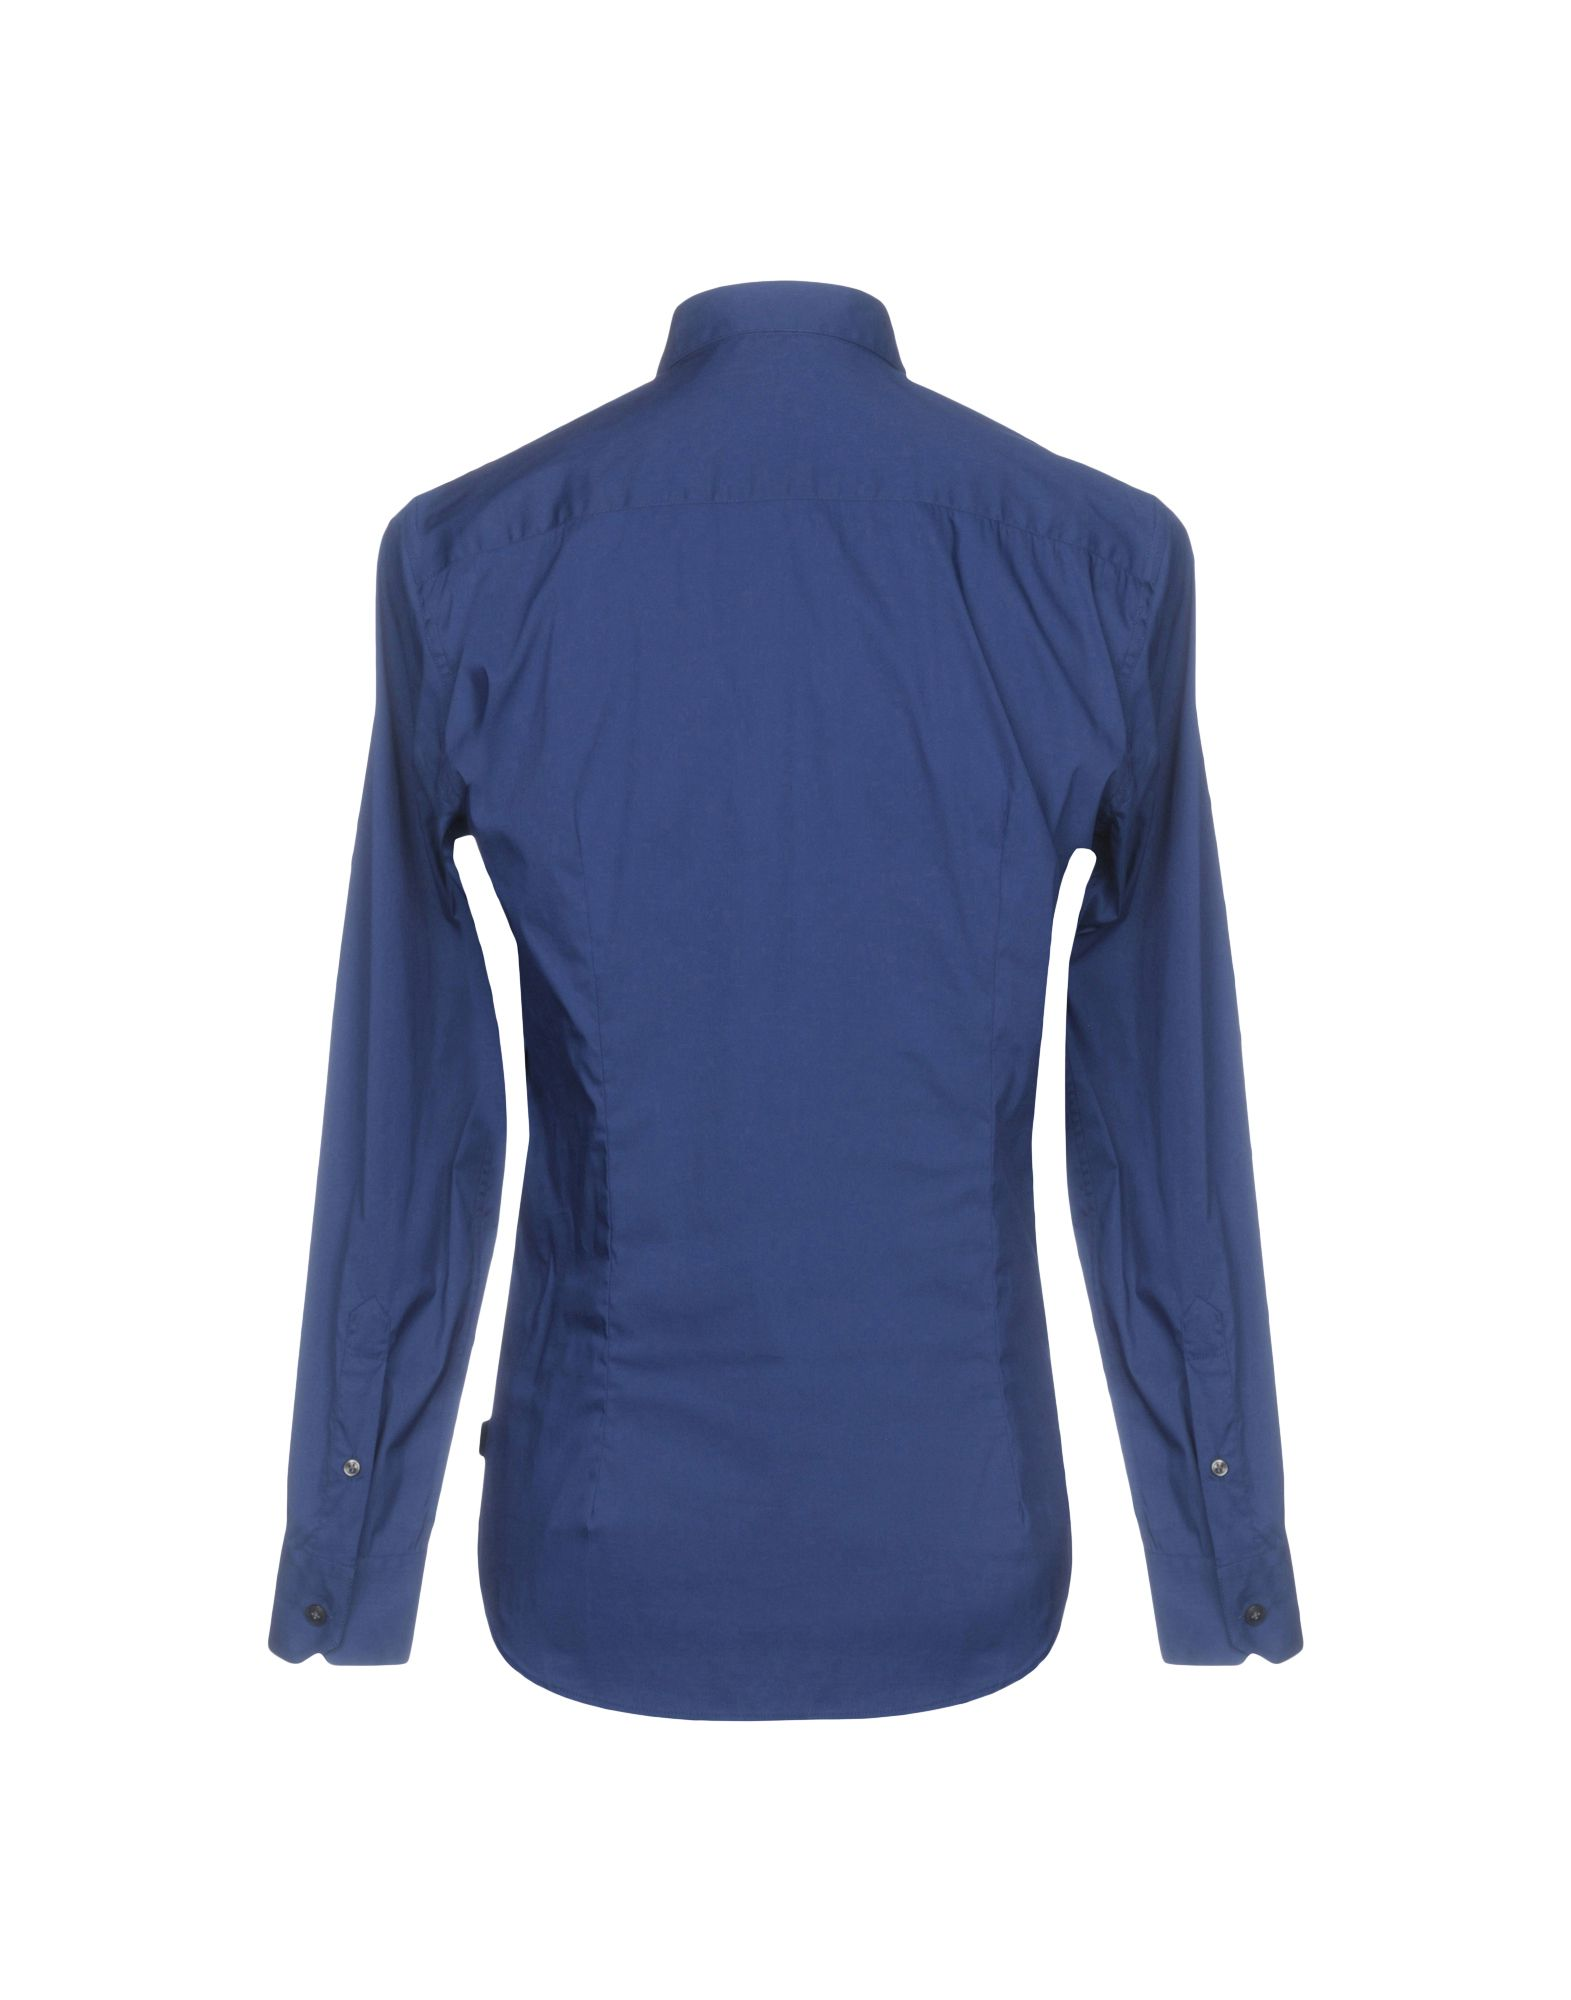 Camicia Tinta - Unita Armani Collezioni Uomo - Tinta 38760696MO 459043